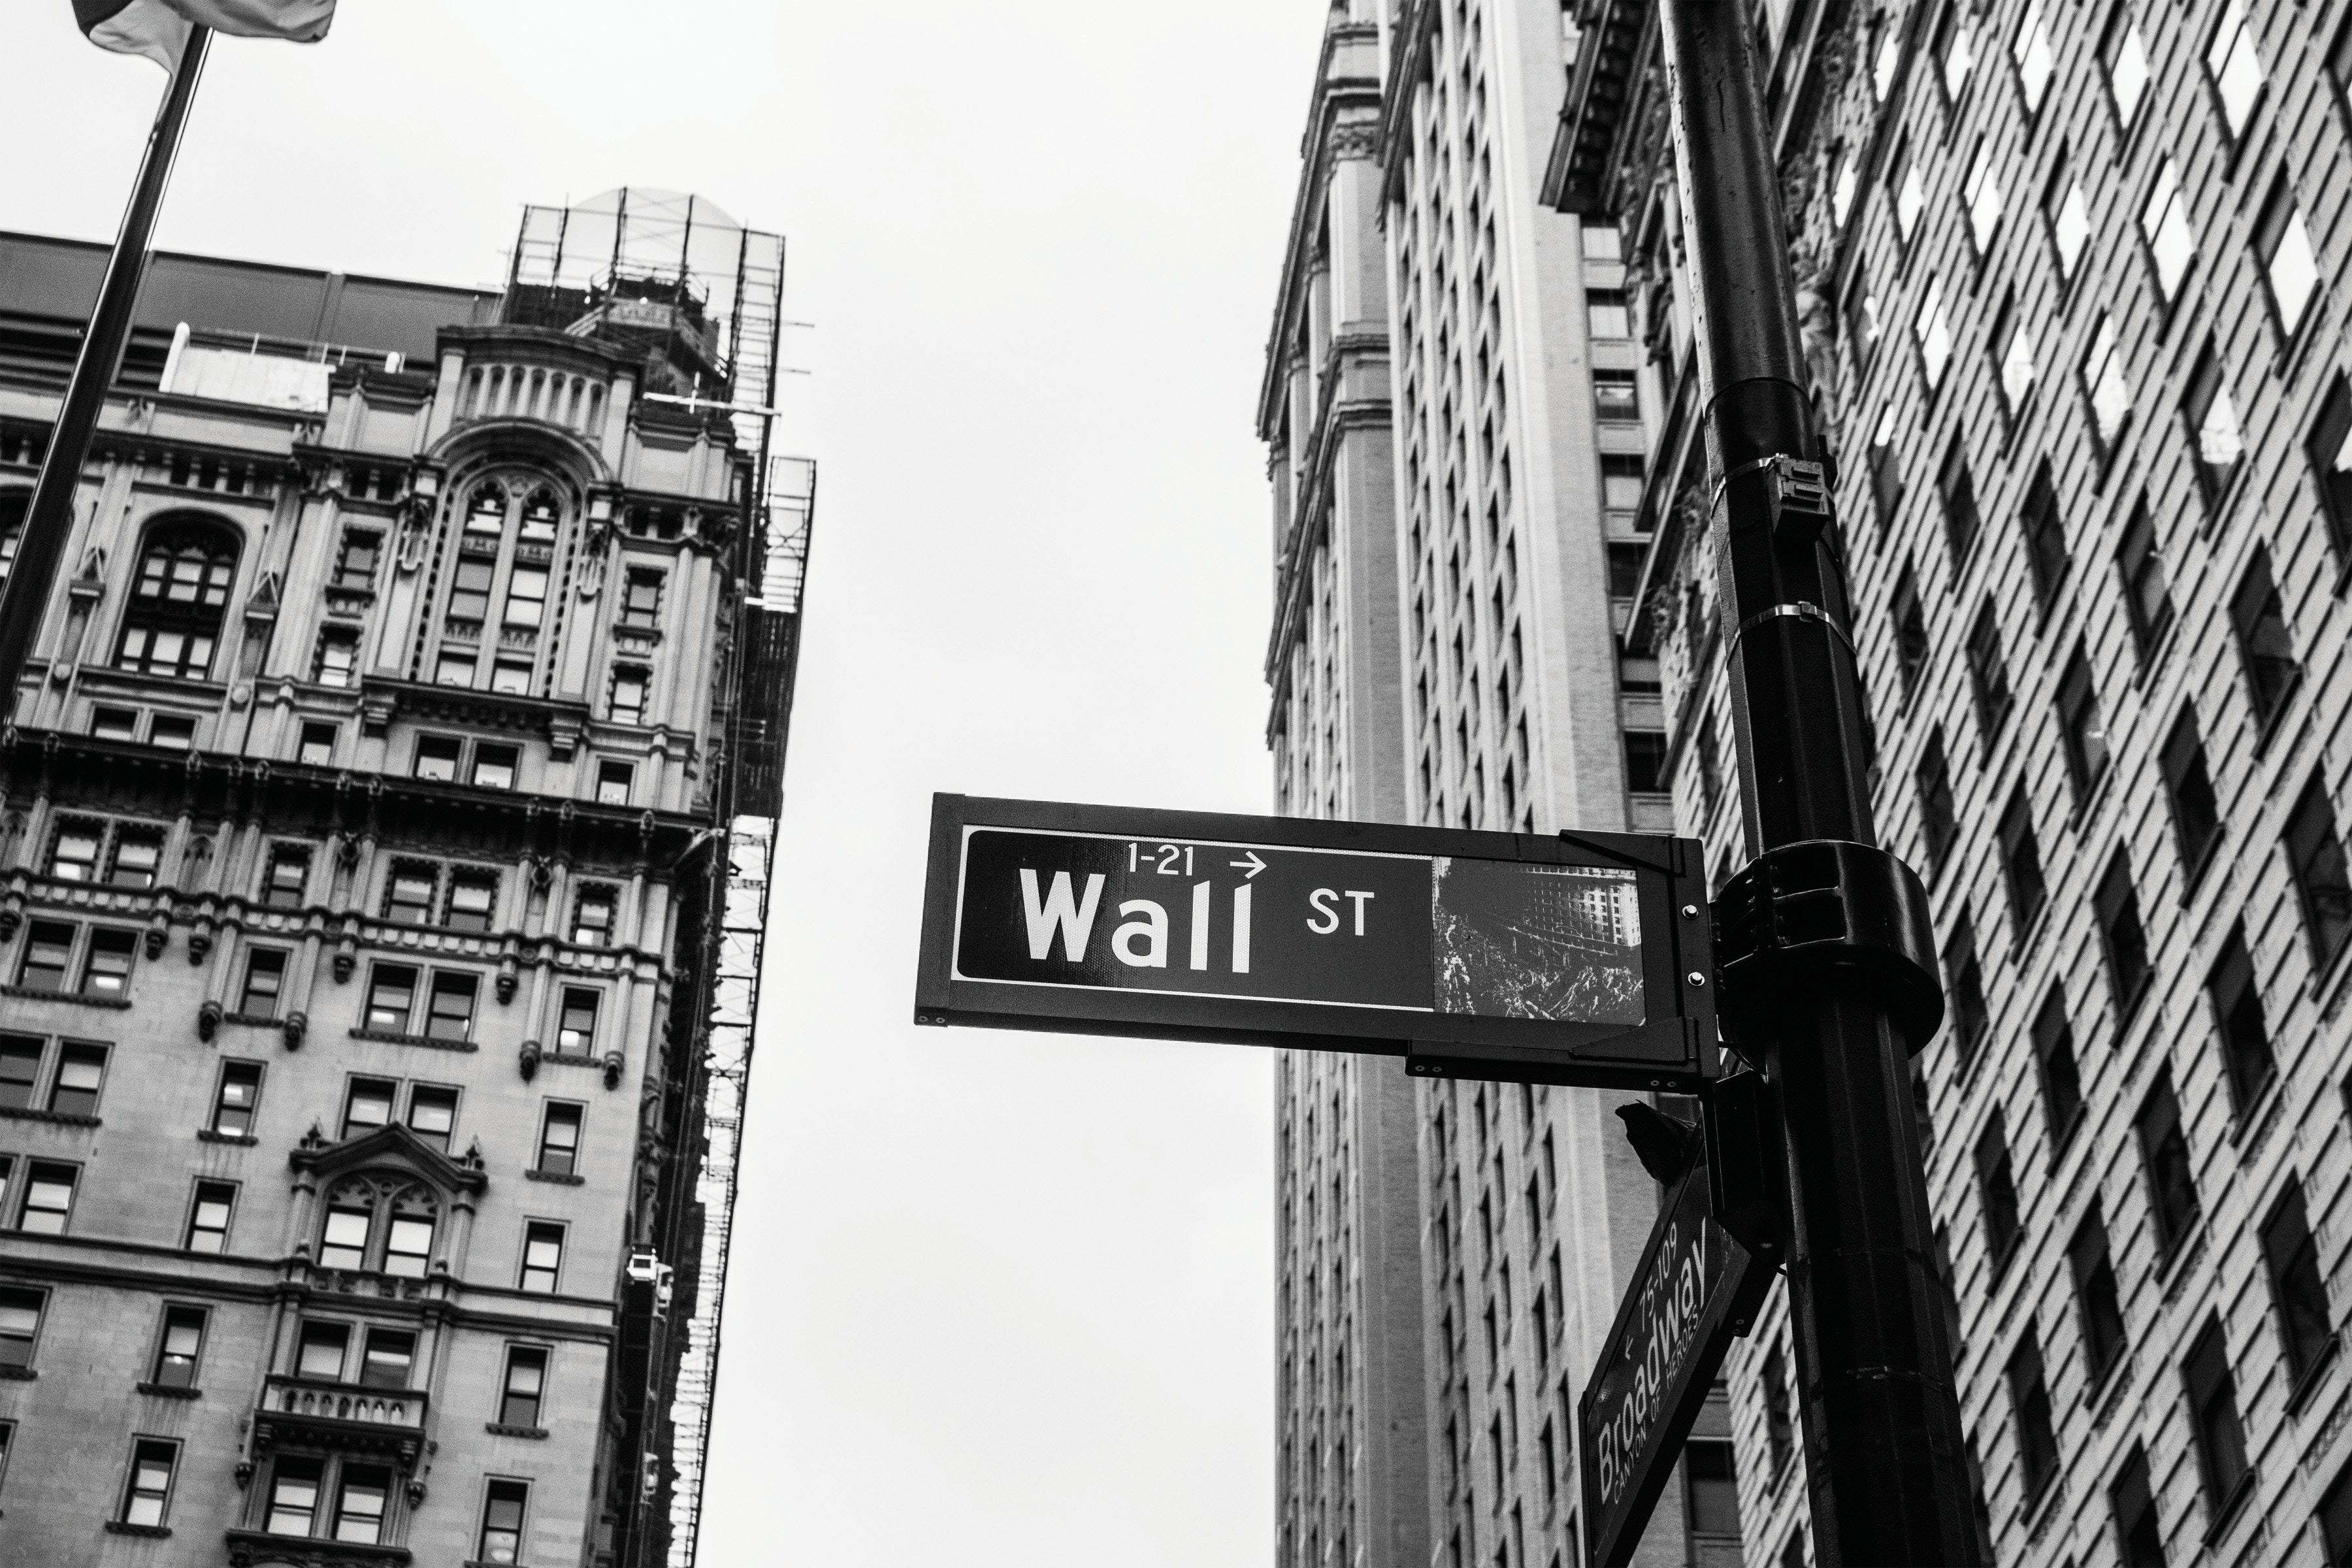 Wall Street, New York City - Credits: Chris Li, Unsplash